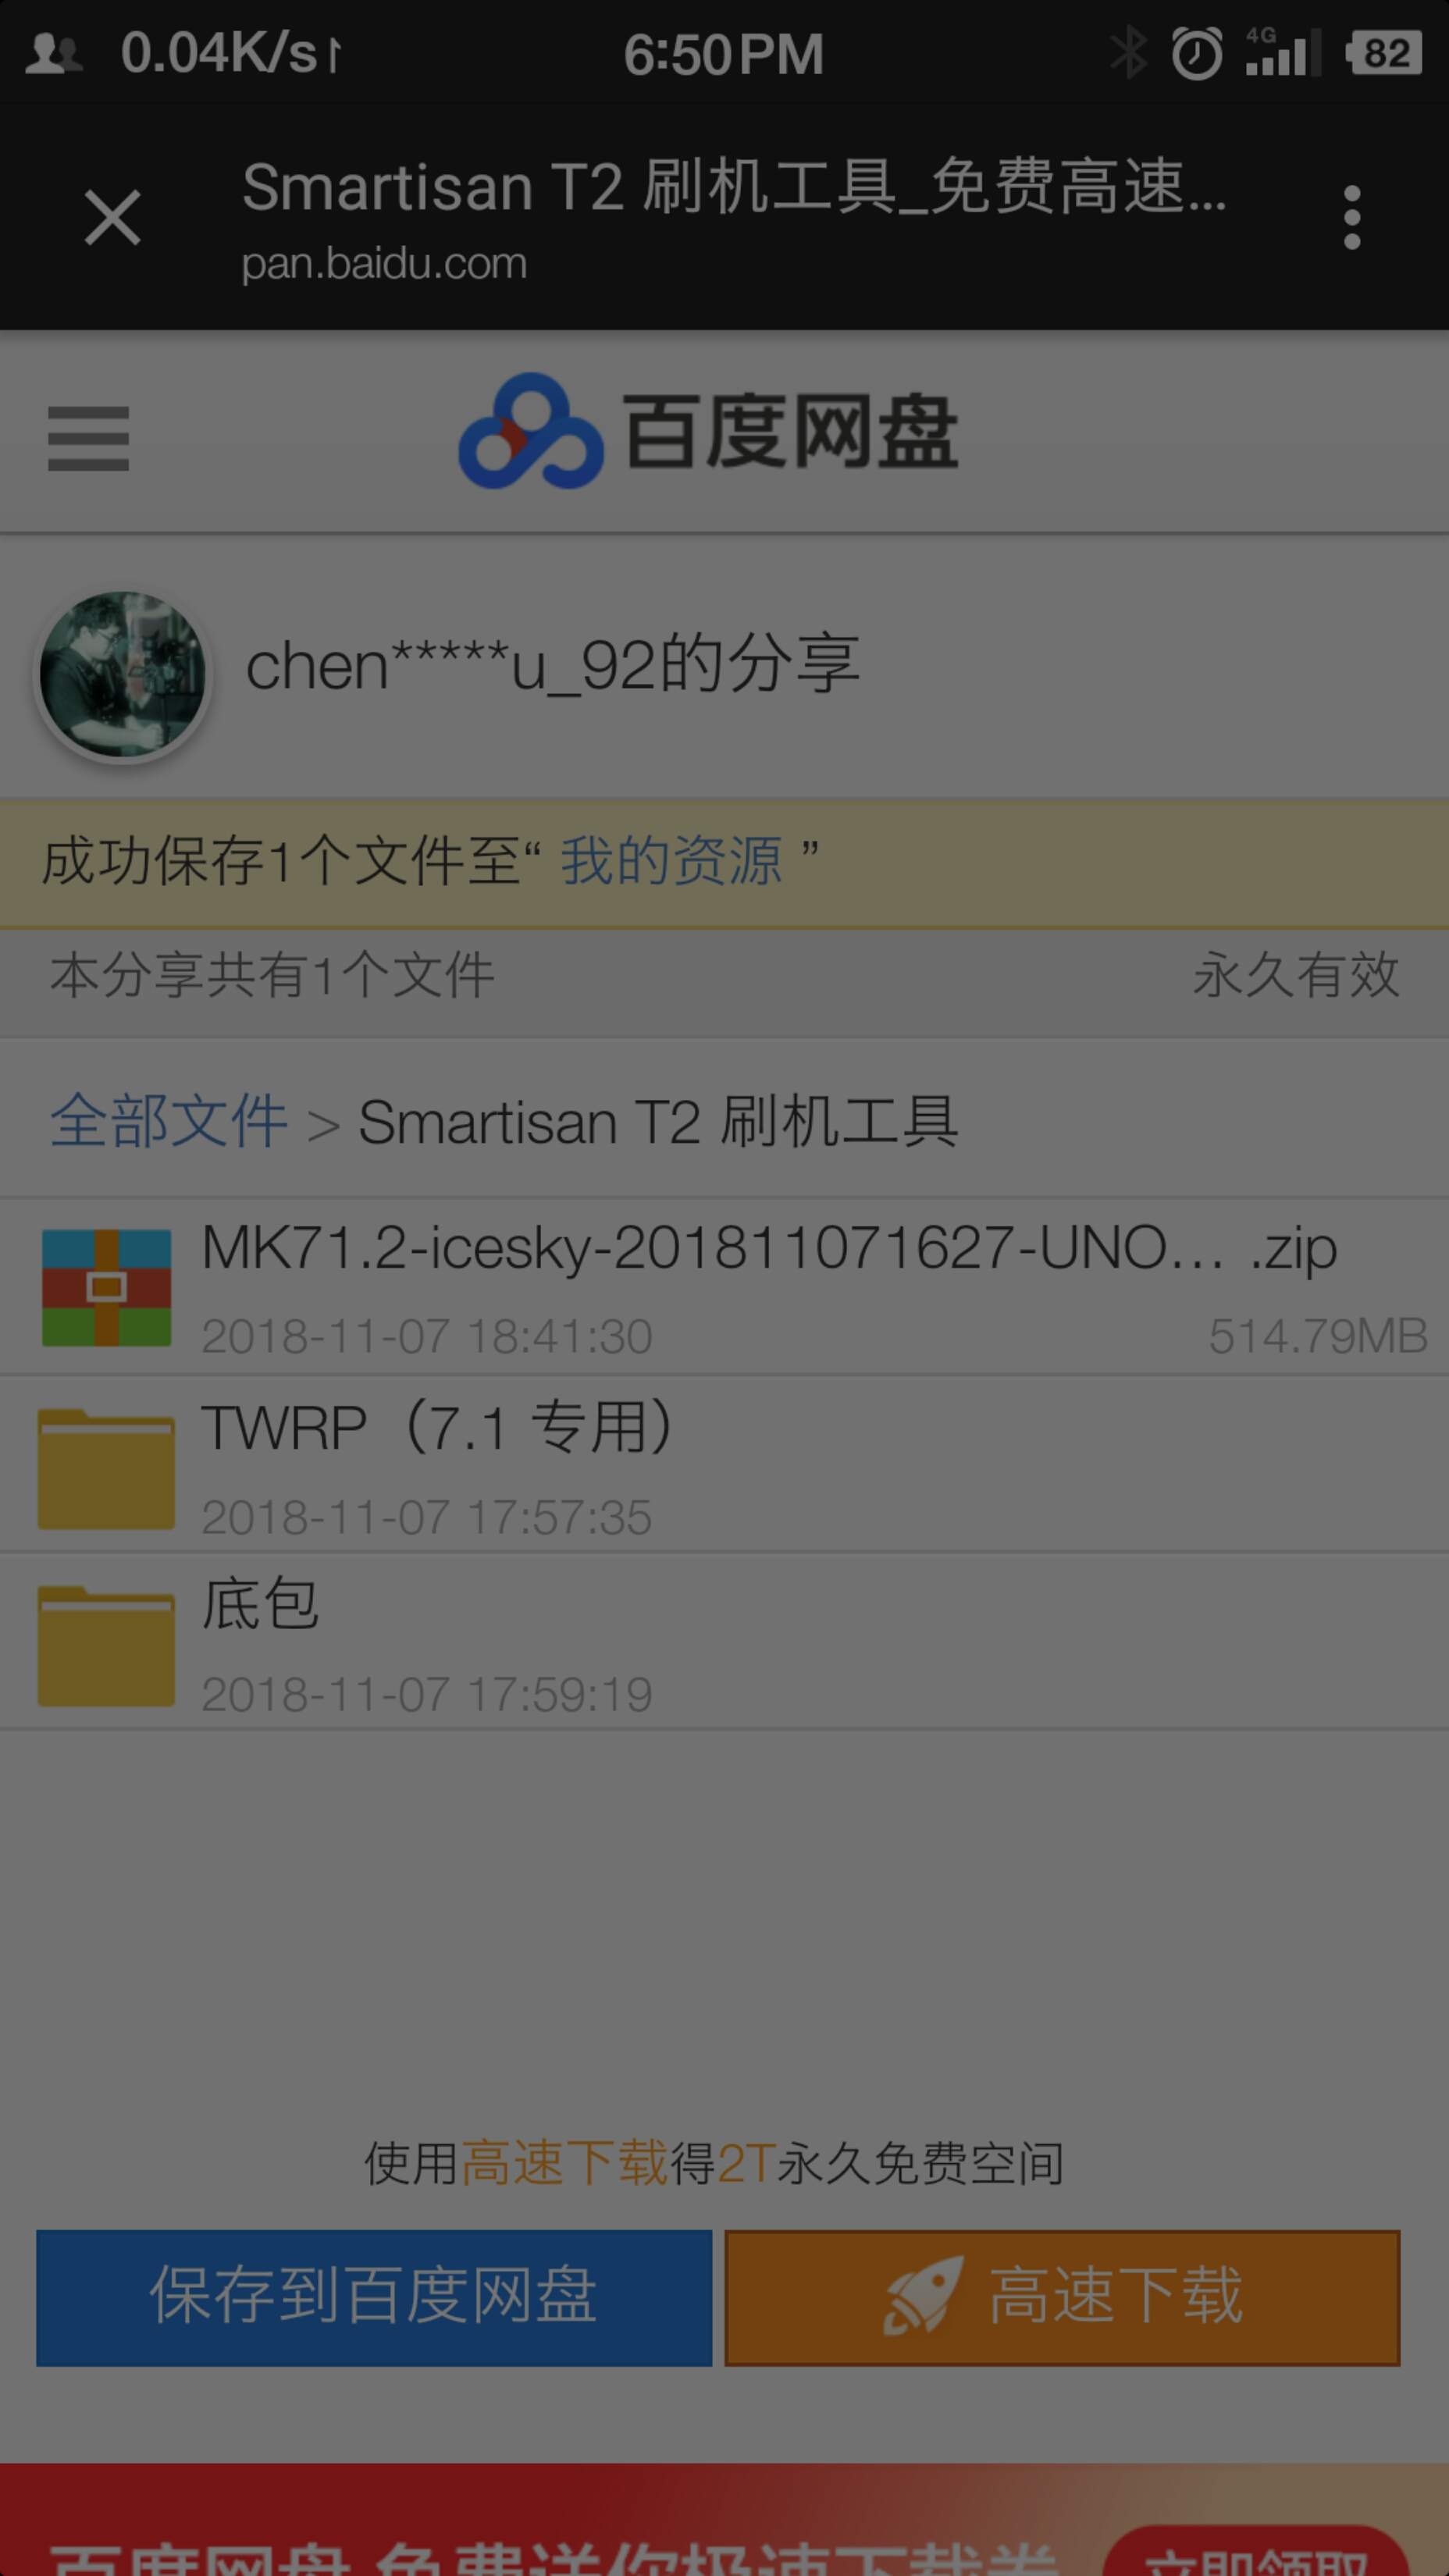 Screenshot_2018-11-07-18-50-42-882_Share.png